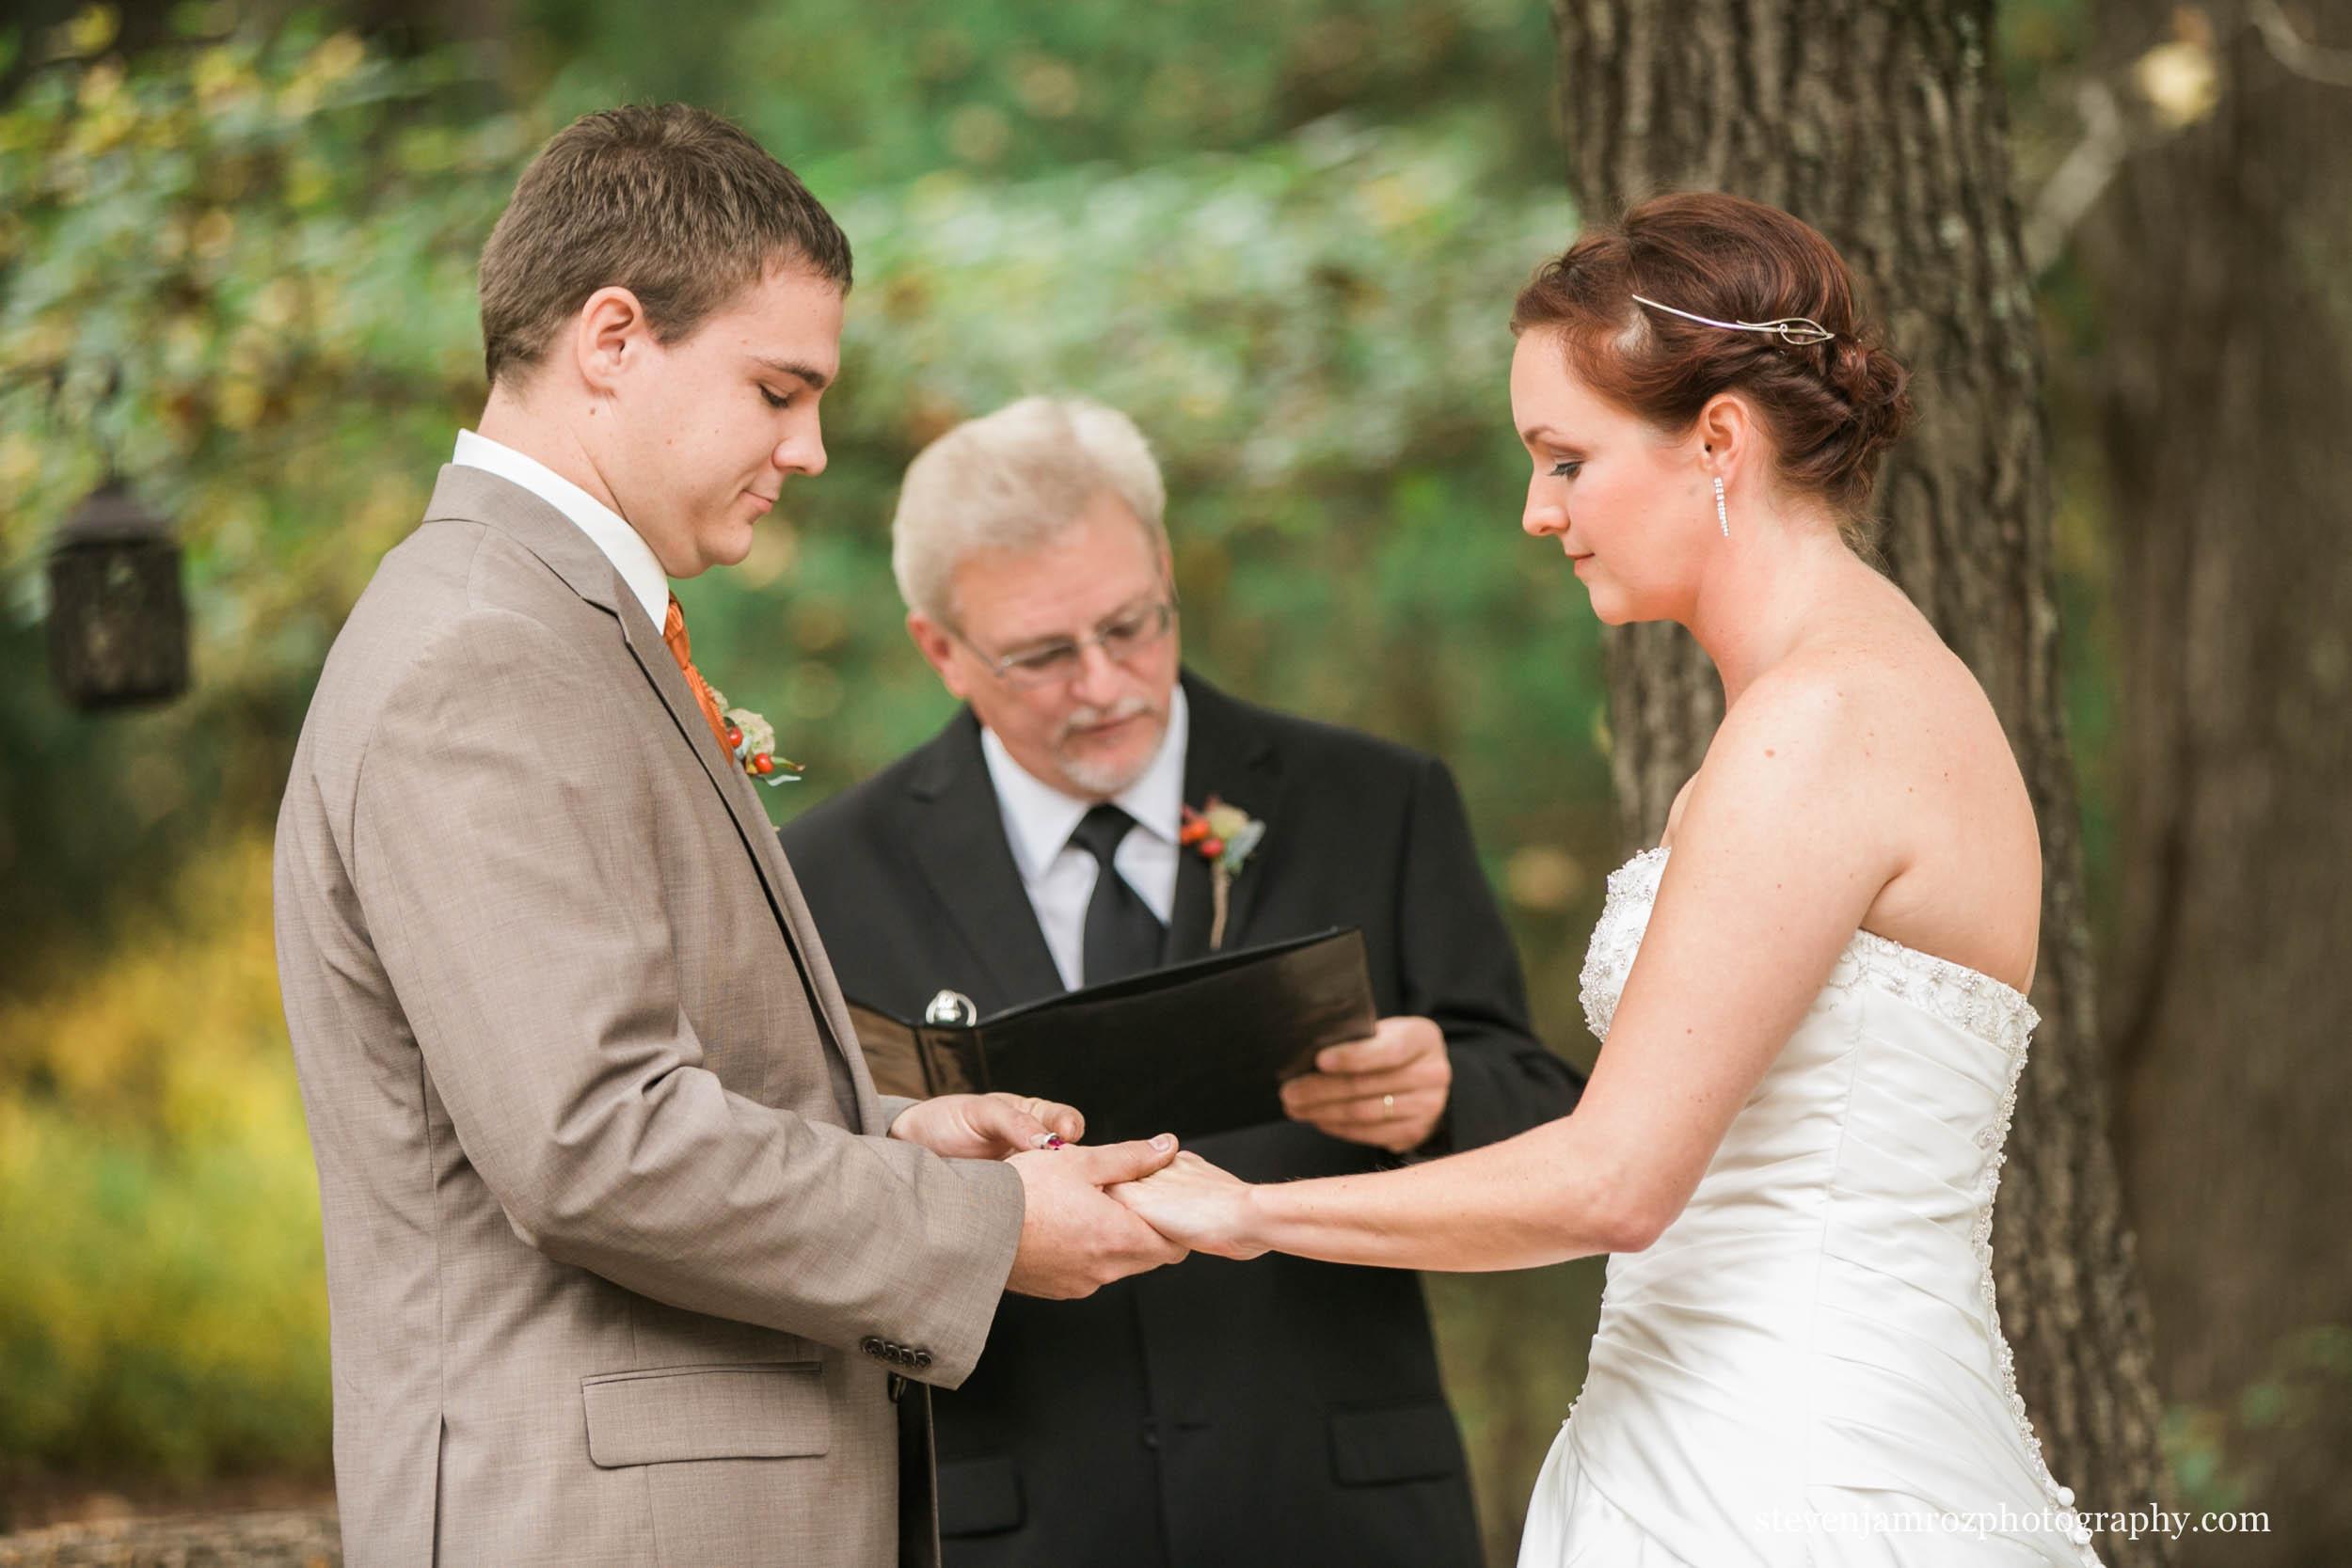 nc-youngsville-wedding-steven-jamroz-photography-0542.jpg